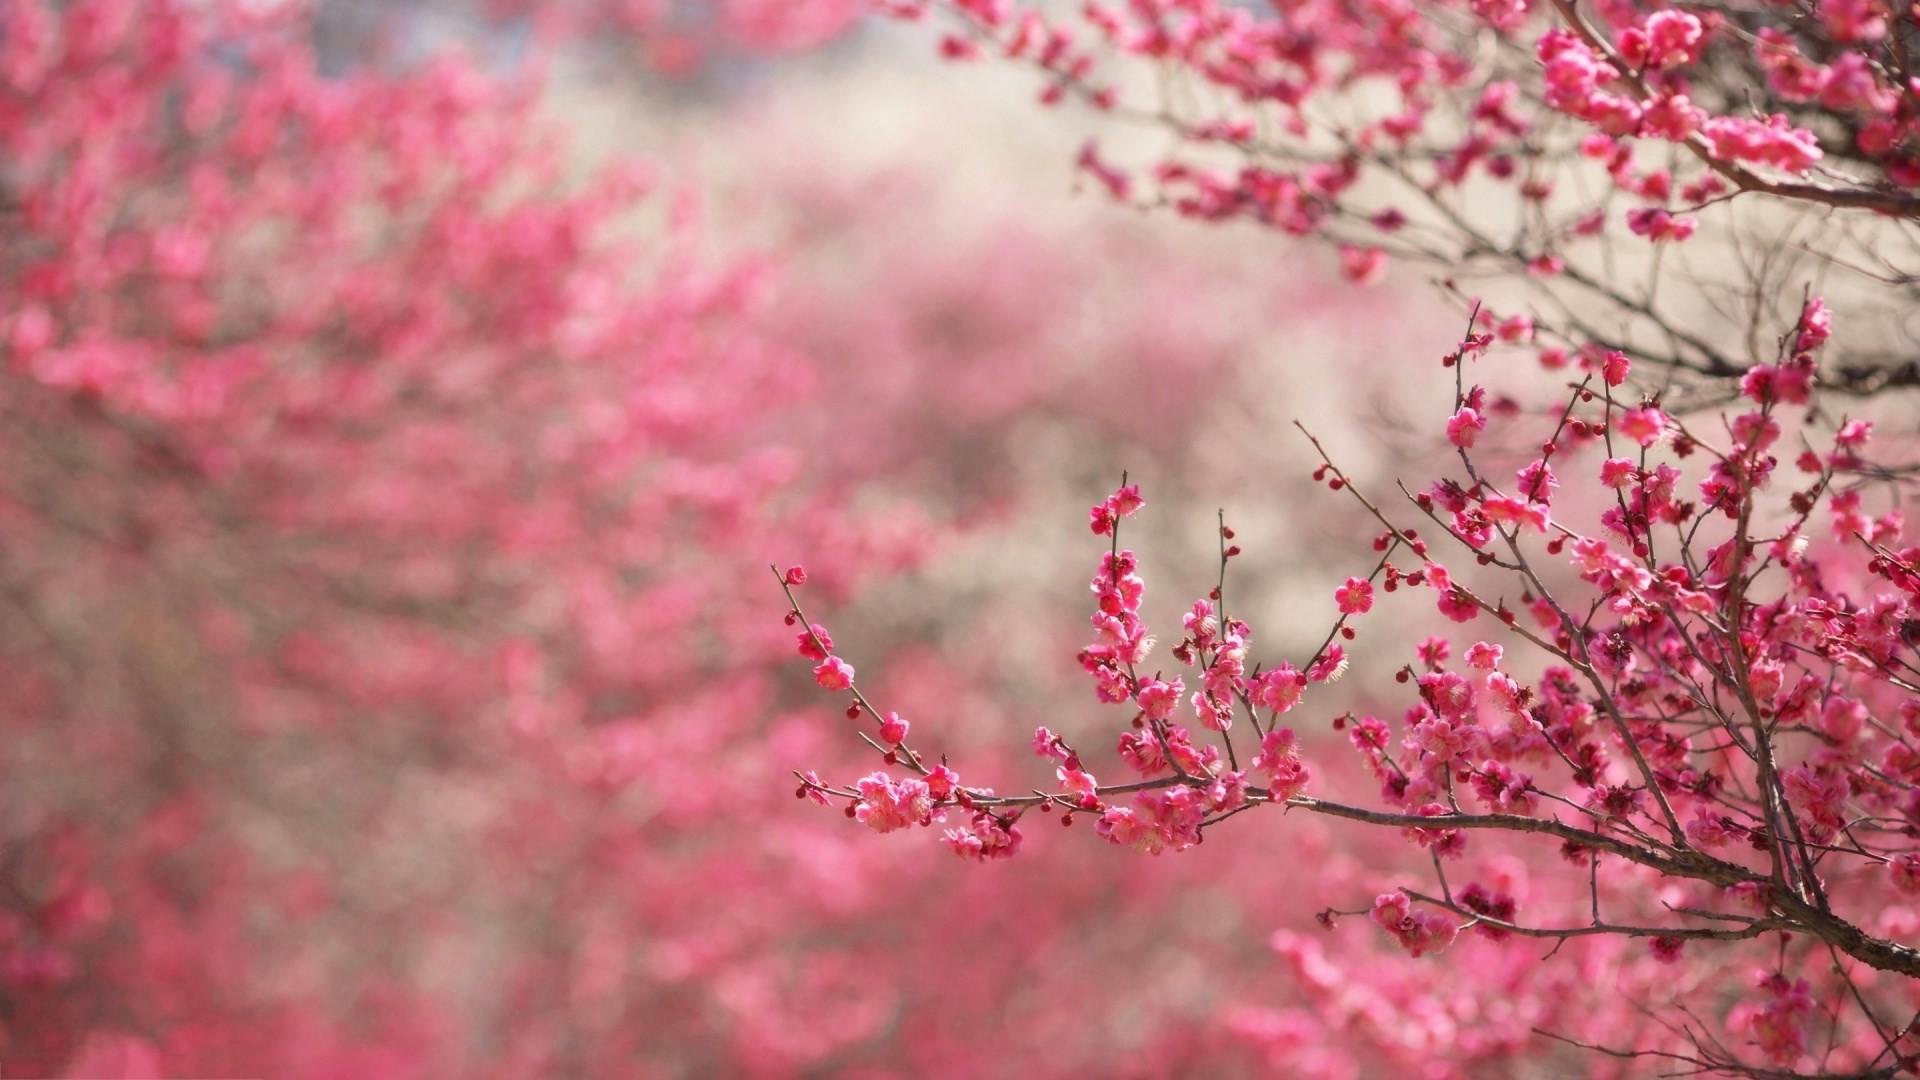 Mount Fuji Wallpaper Iphone Cherry Blossom Hd Wallpaper 71 Images